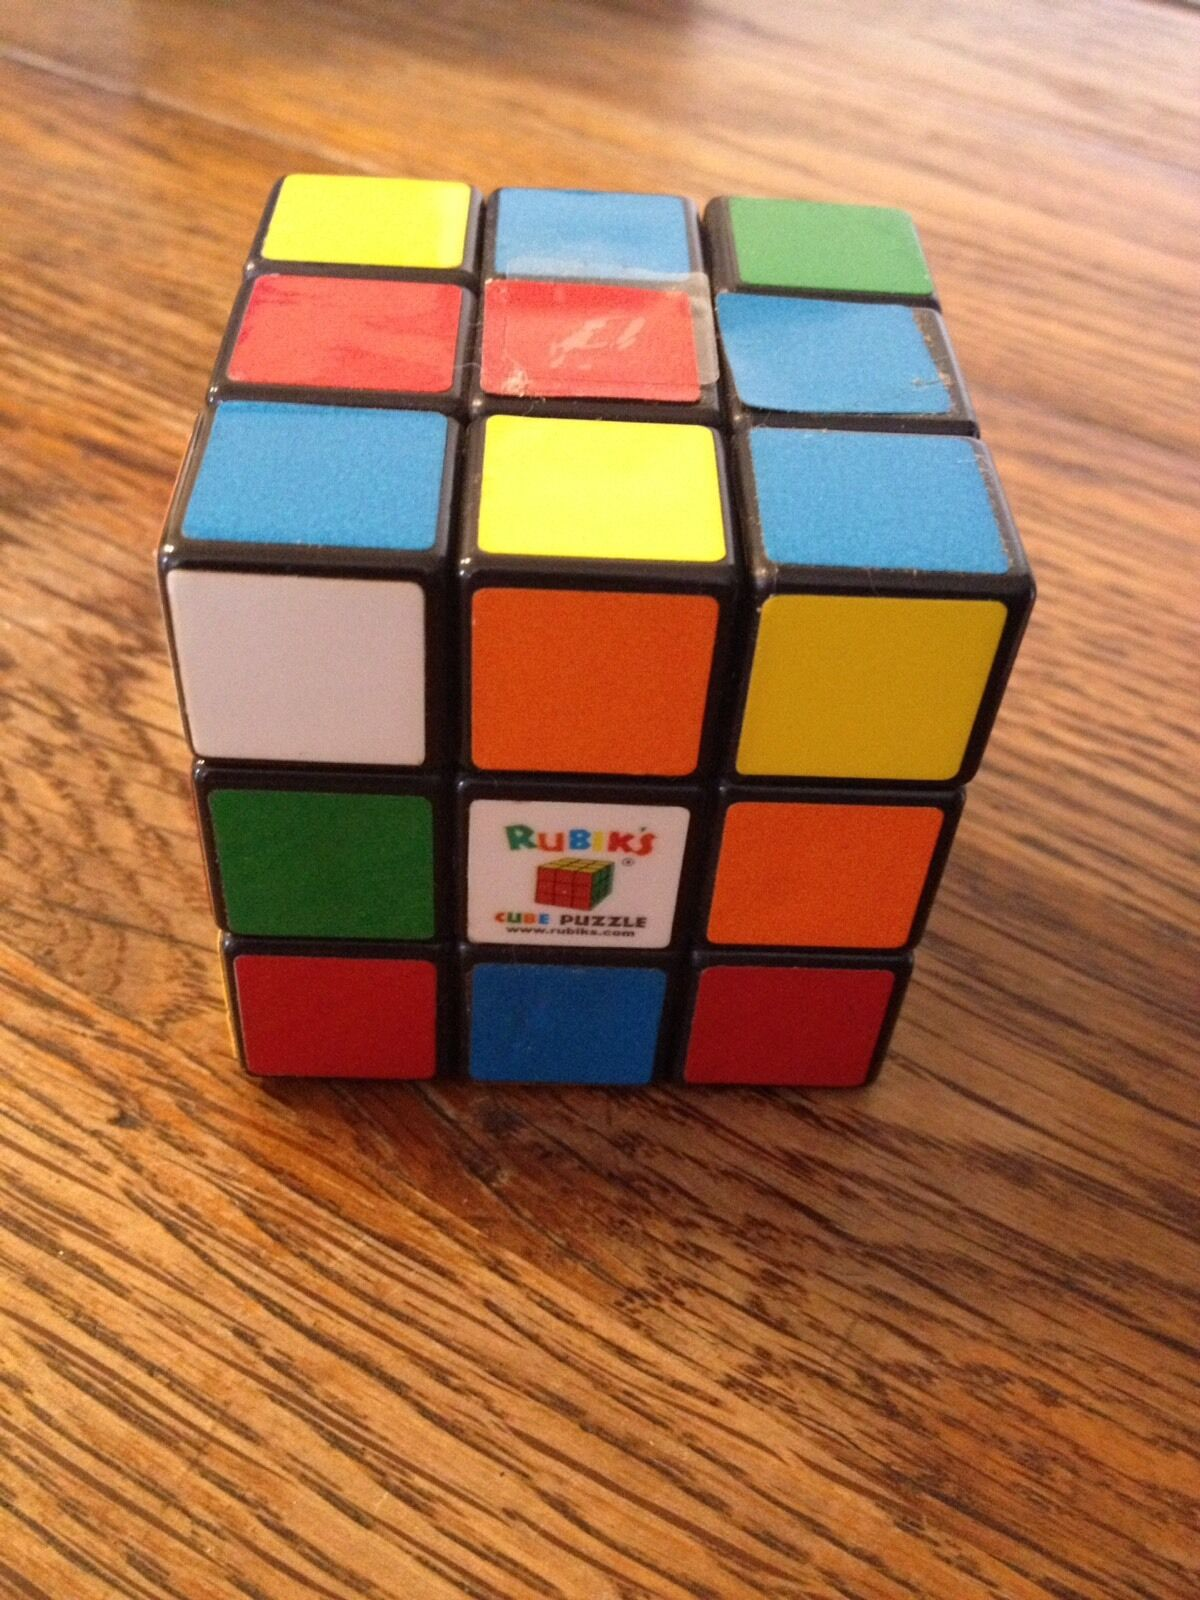 RARE non résolus Rubik's Cube Puzzle